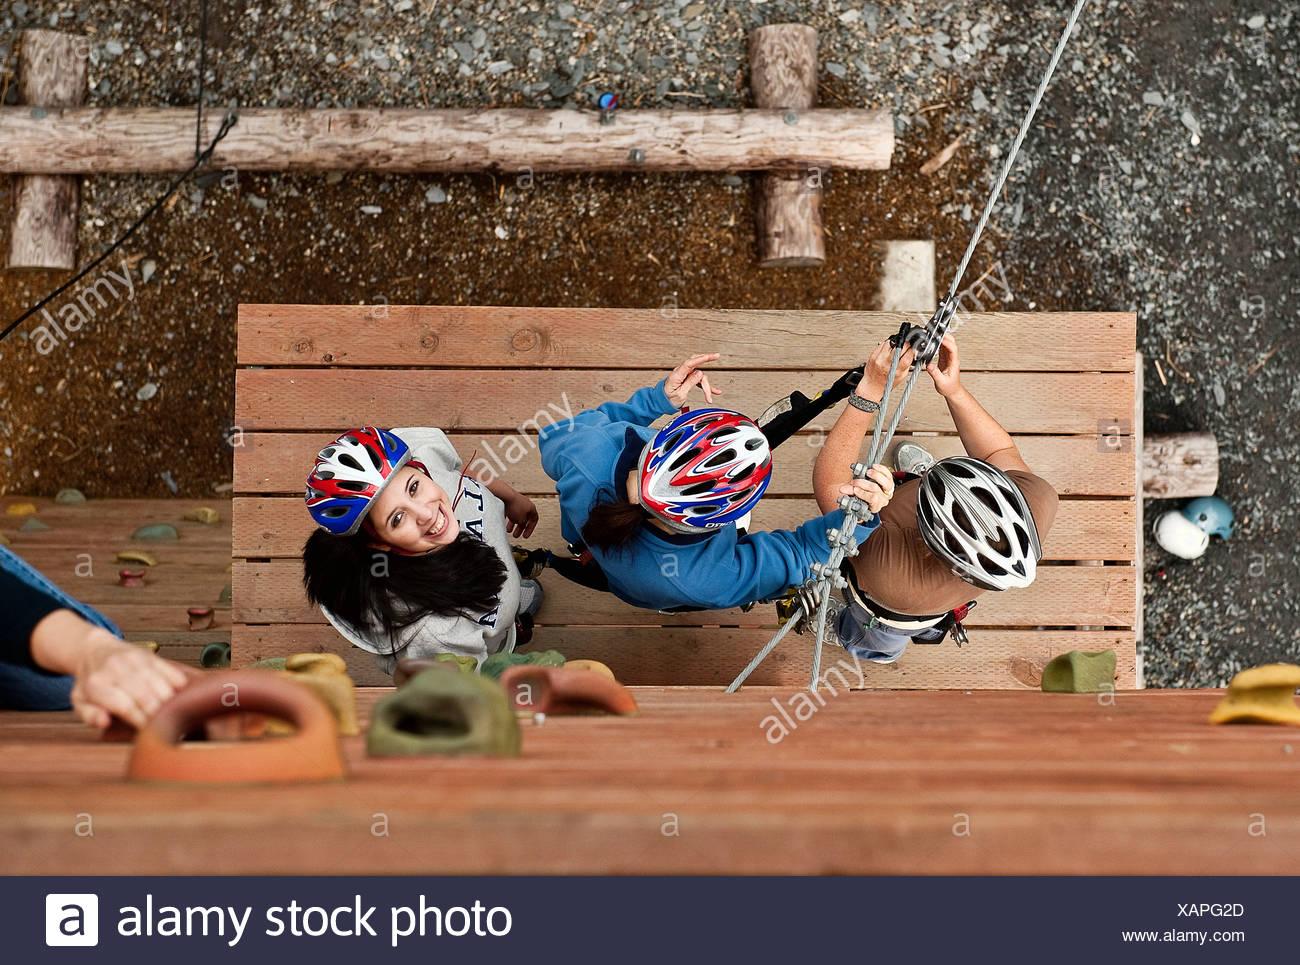 Woman prepares for a zipline adventure through the trees, Ketchikan, AK, Alaska, USA - Stock Image